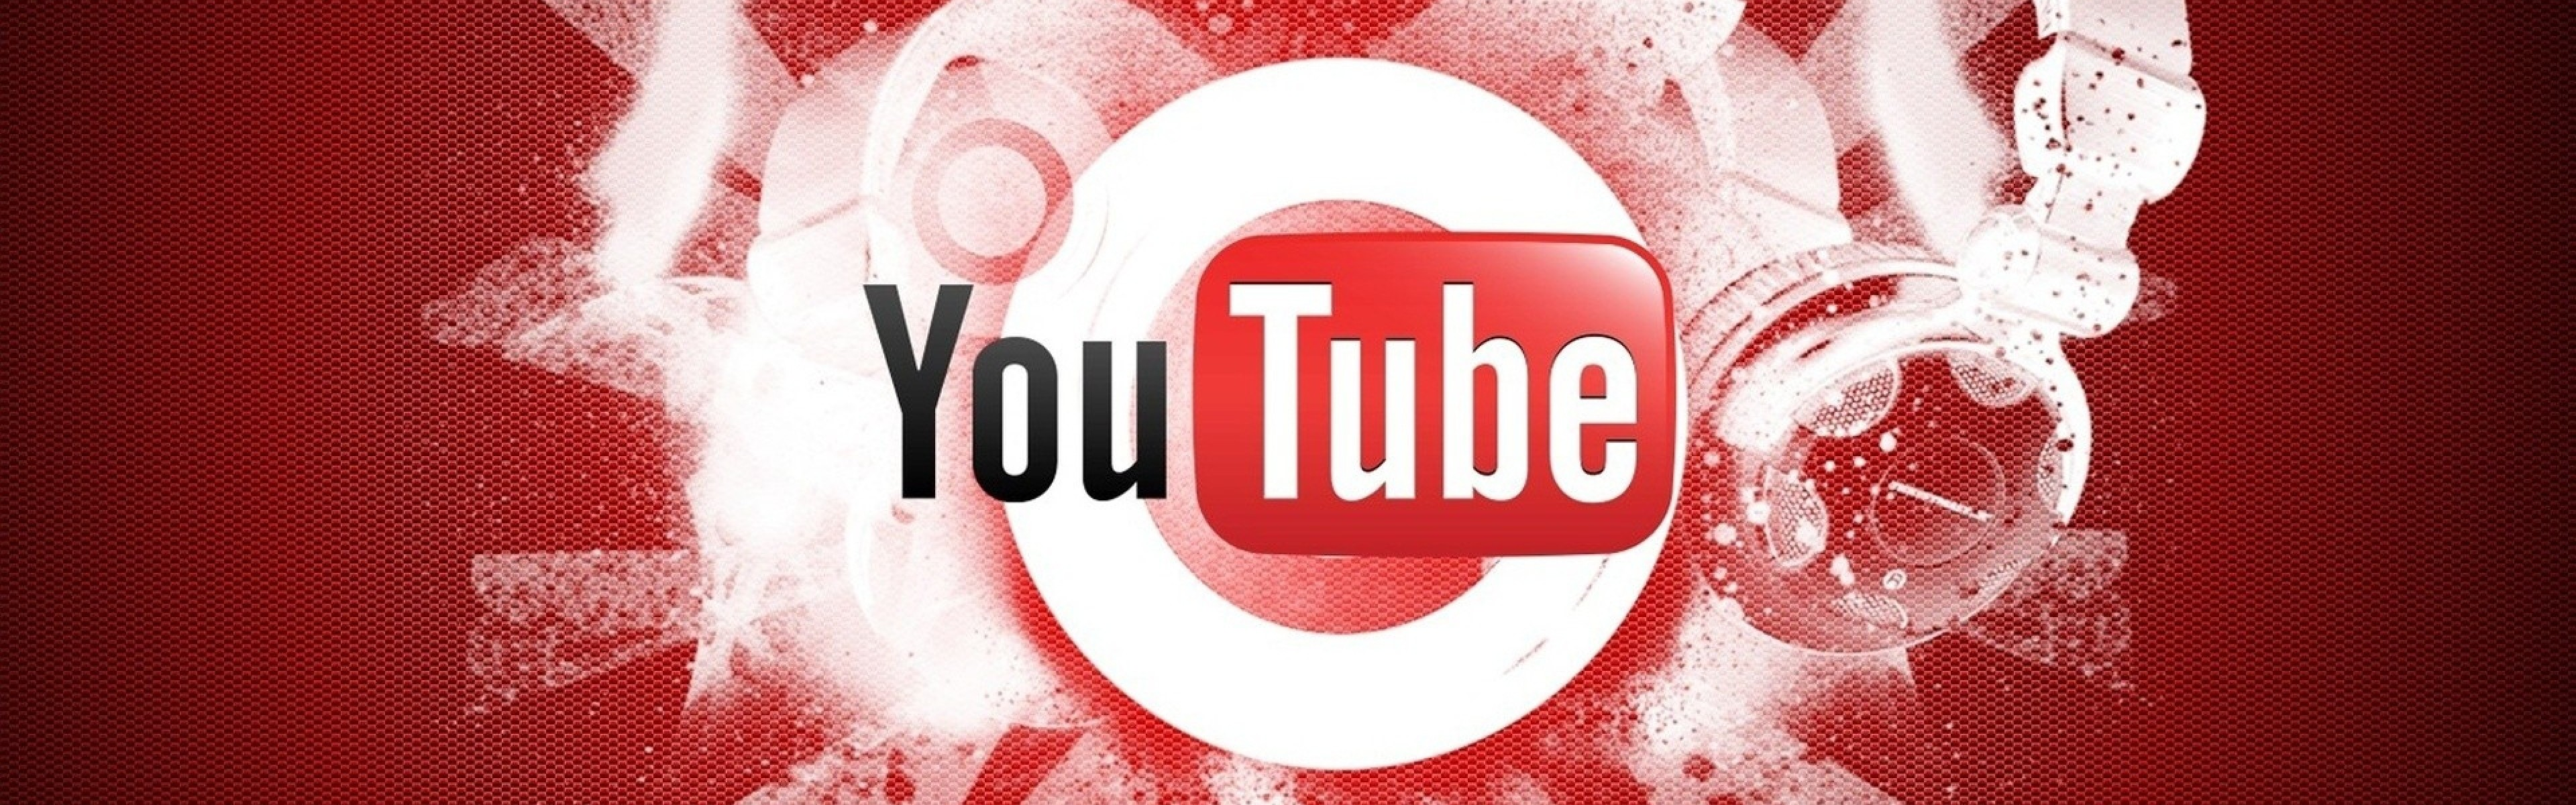 <b>Youtube Wallpaper</b>